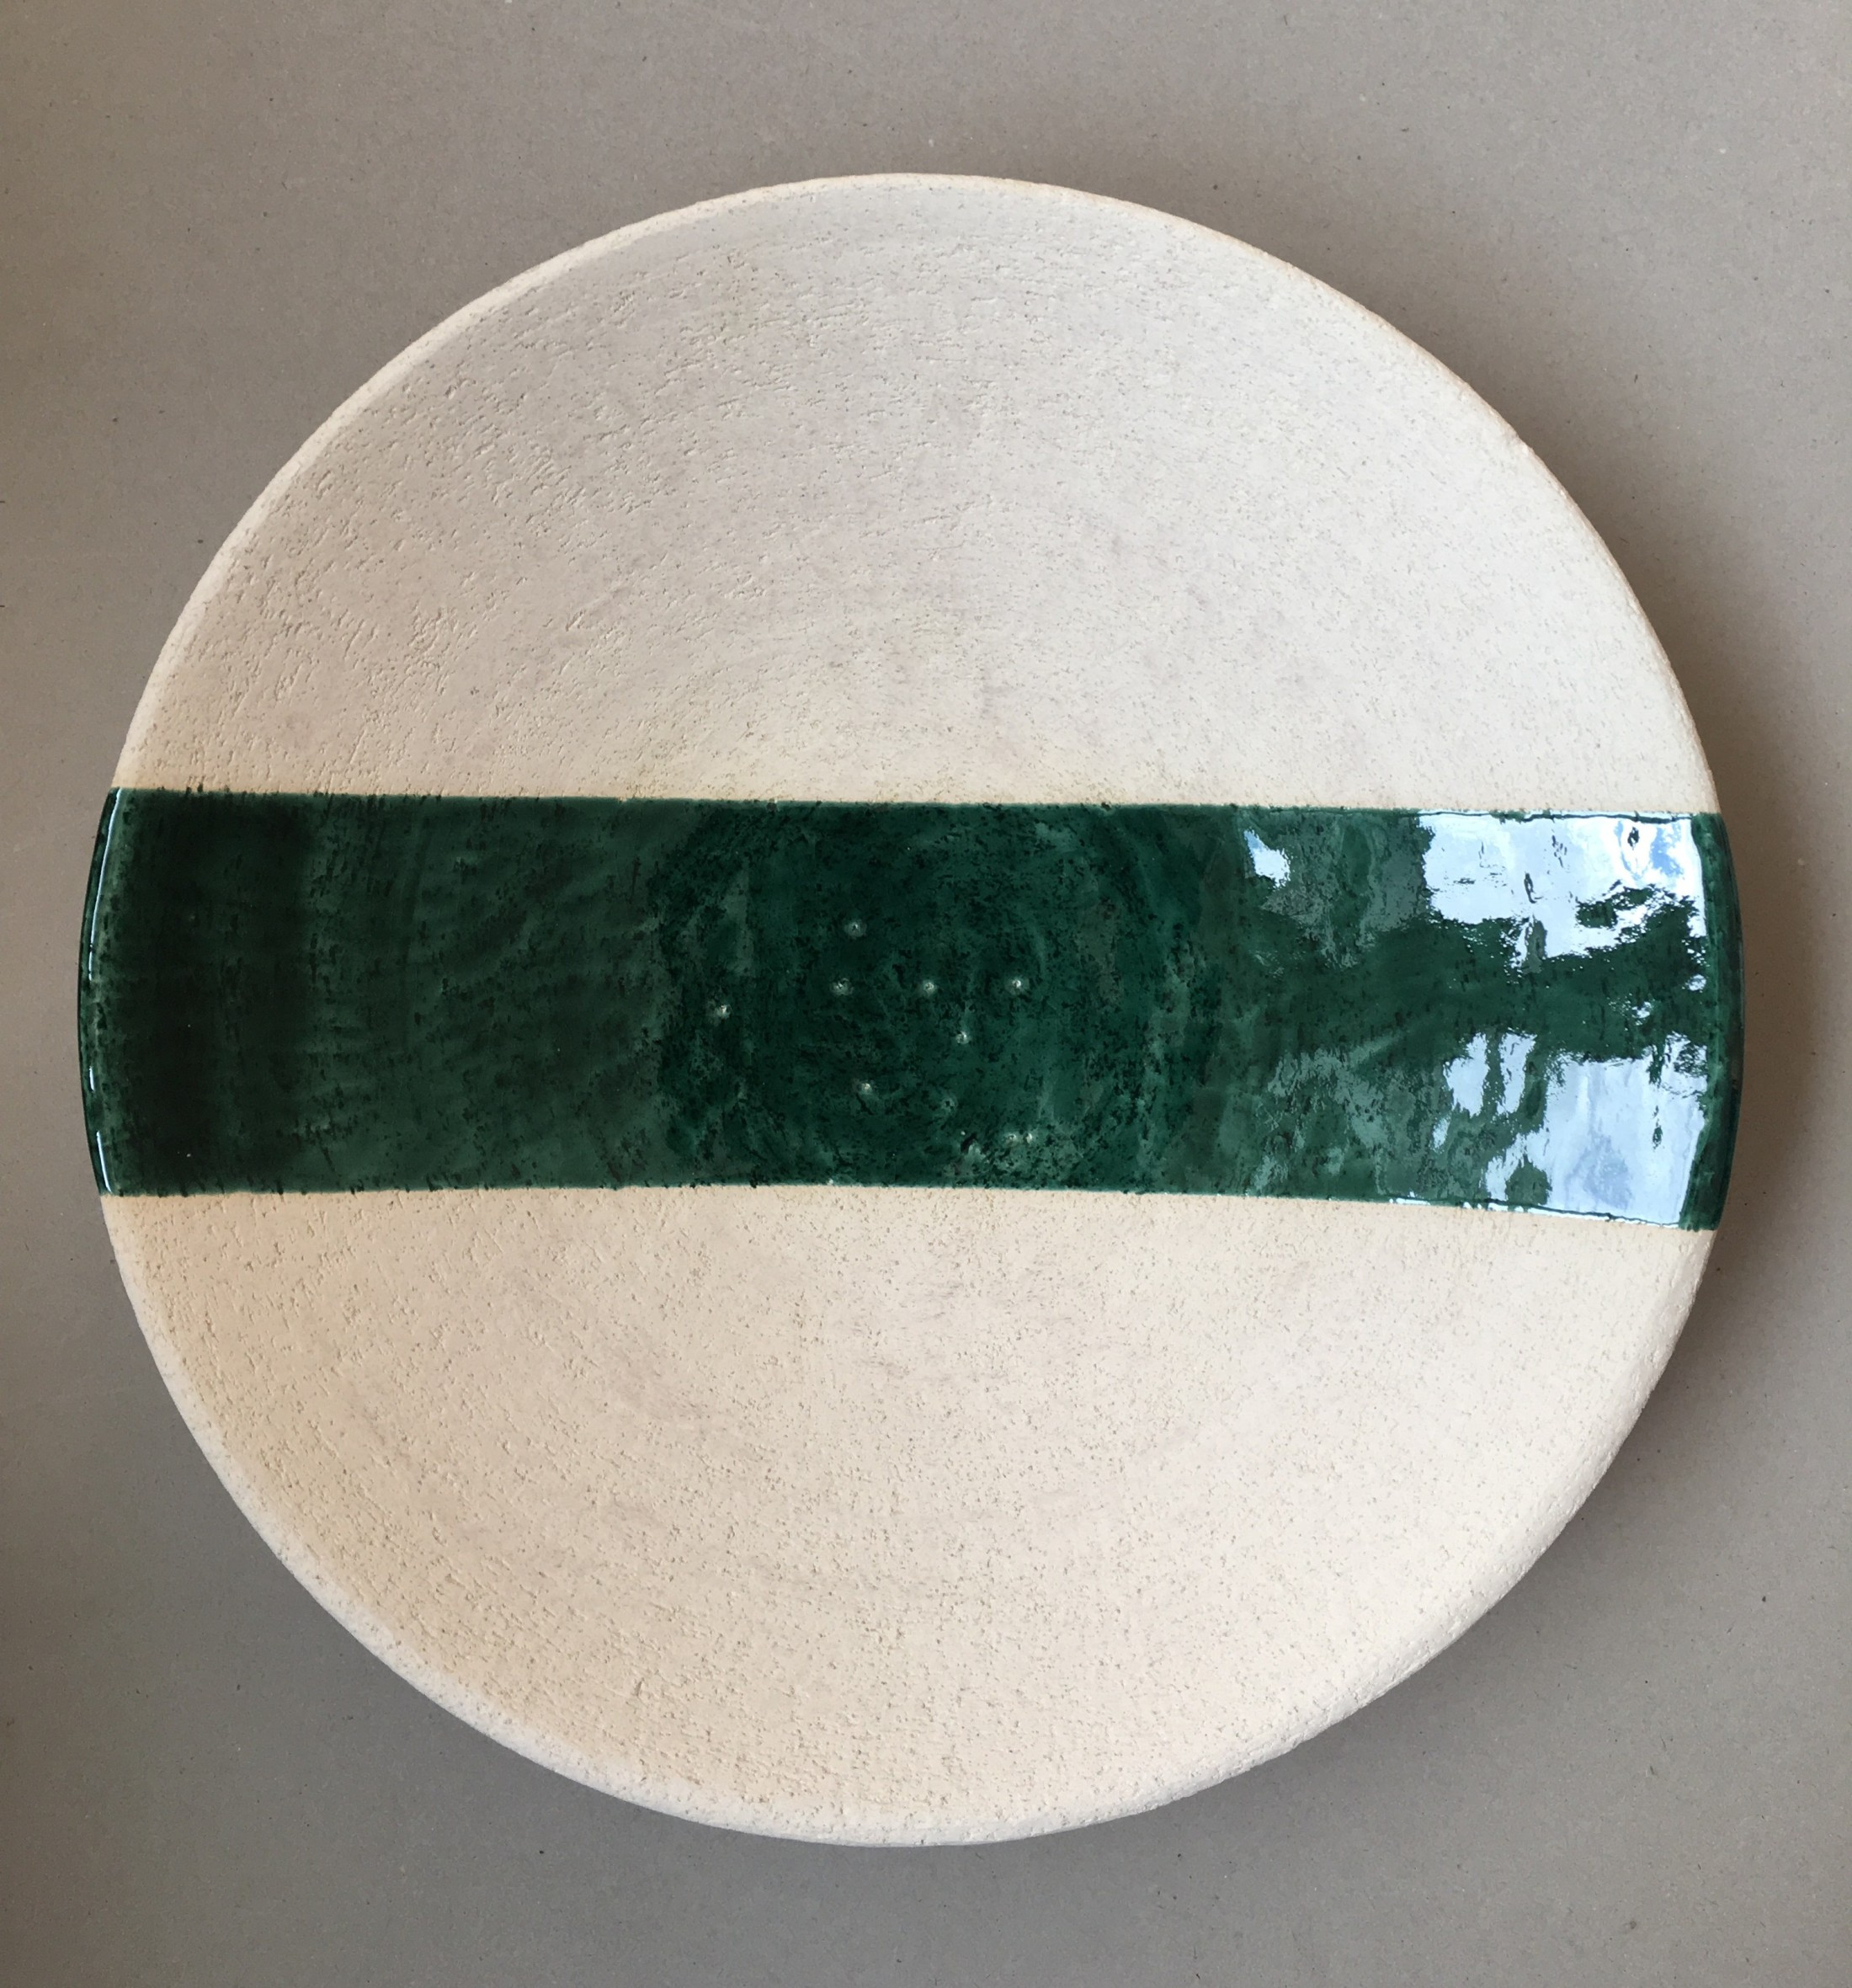 Typographic menu, plate I  Ceramic art work for TypocraftHelsinki17 exhibition at Gallery Lokal in Helsinki.